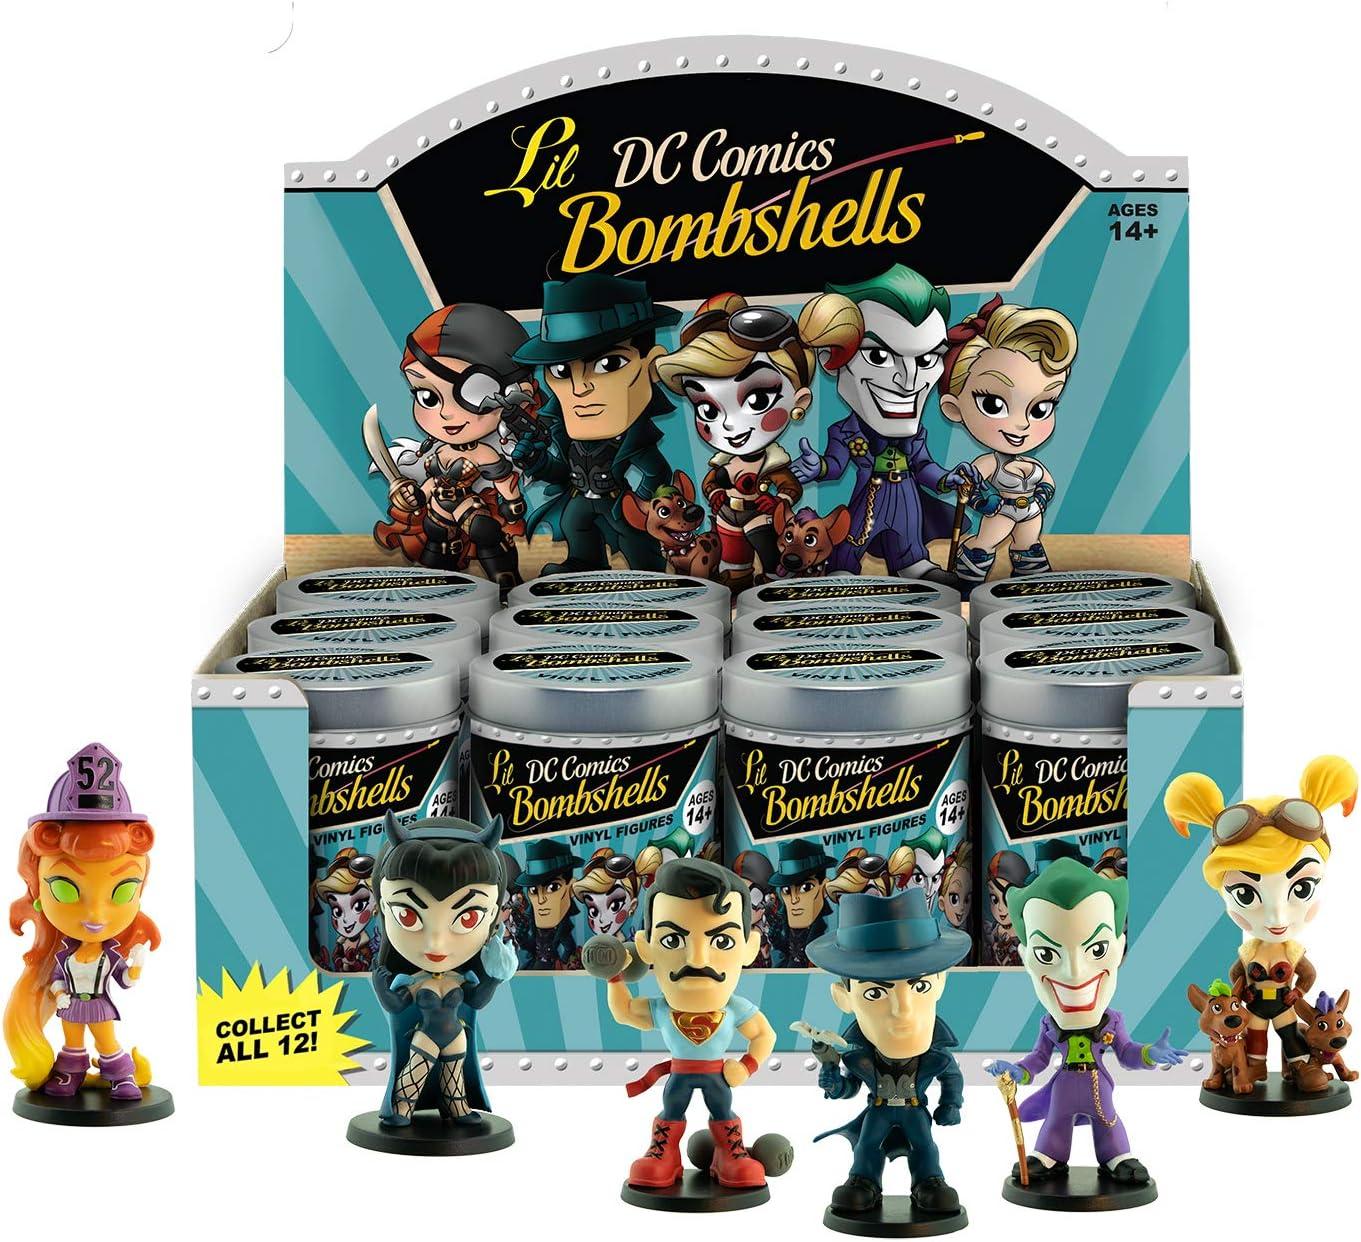 Poison Ivy Cryptozoic Entertainment DC Comics Lil Bombshells